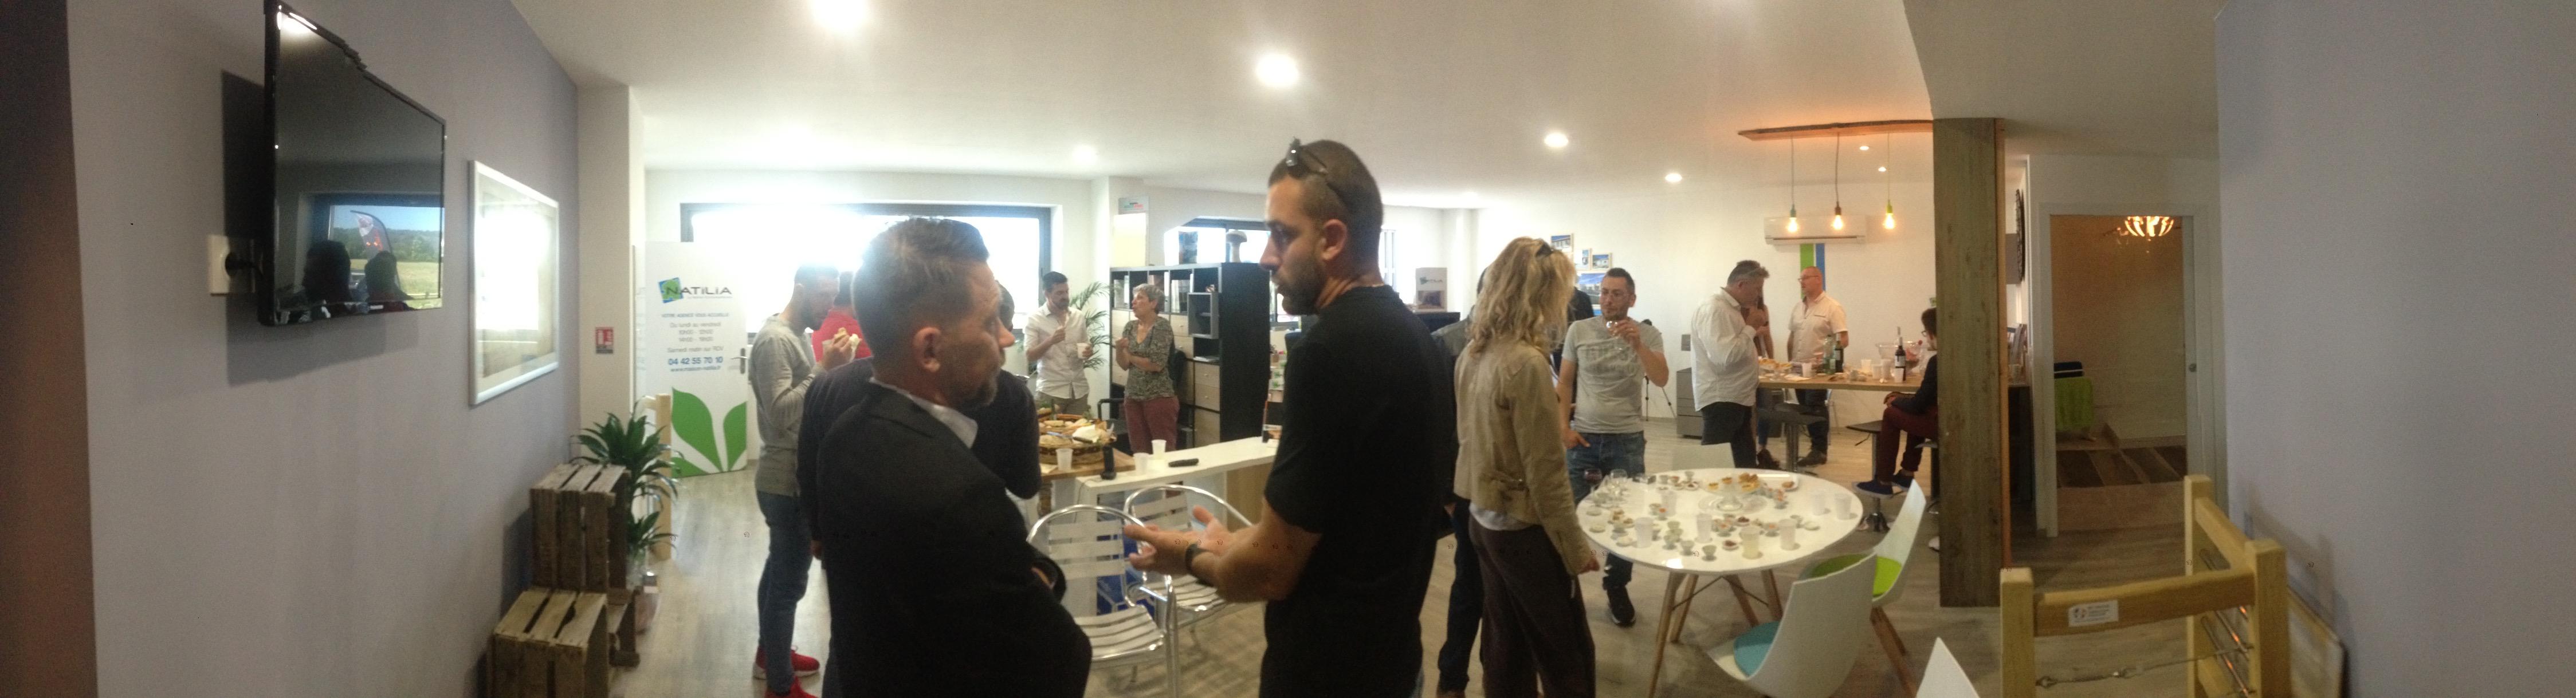 inauguration de l agence natilia salon de provence franchise natilia. Black Bedroom Furniture Sets. Home Design Ideas